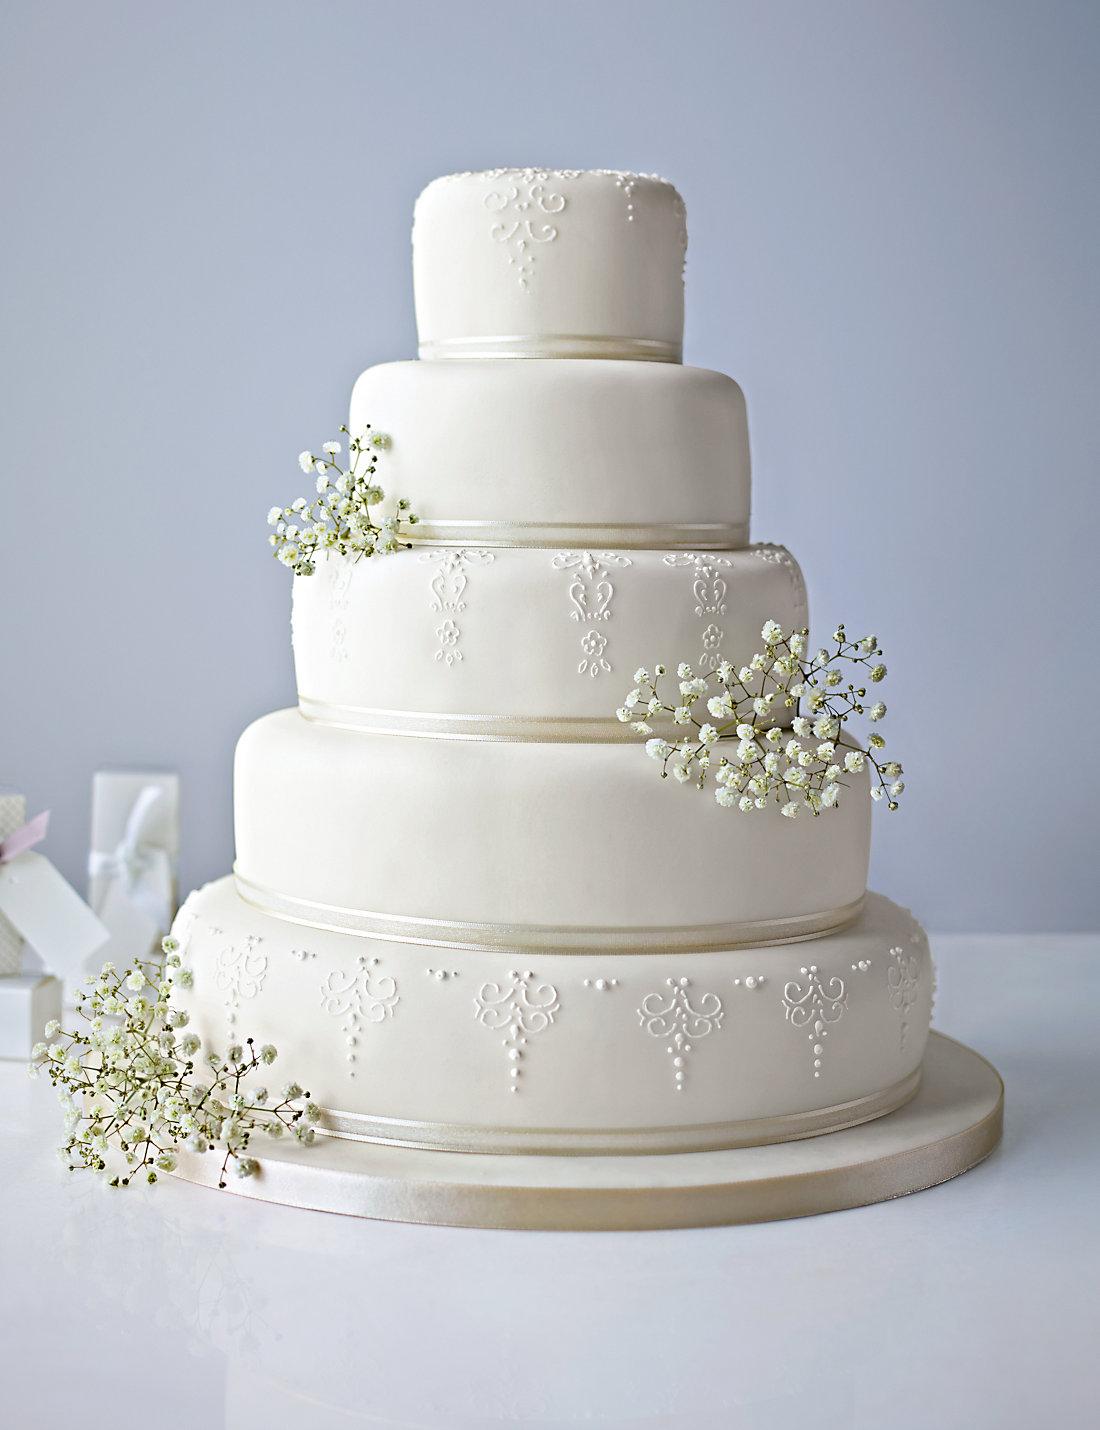 mark and spencer wedding cake - 5000+ Simple Wedding Cakes